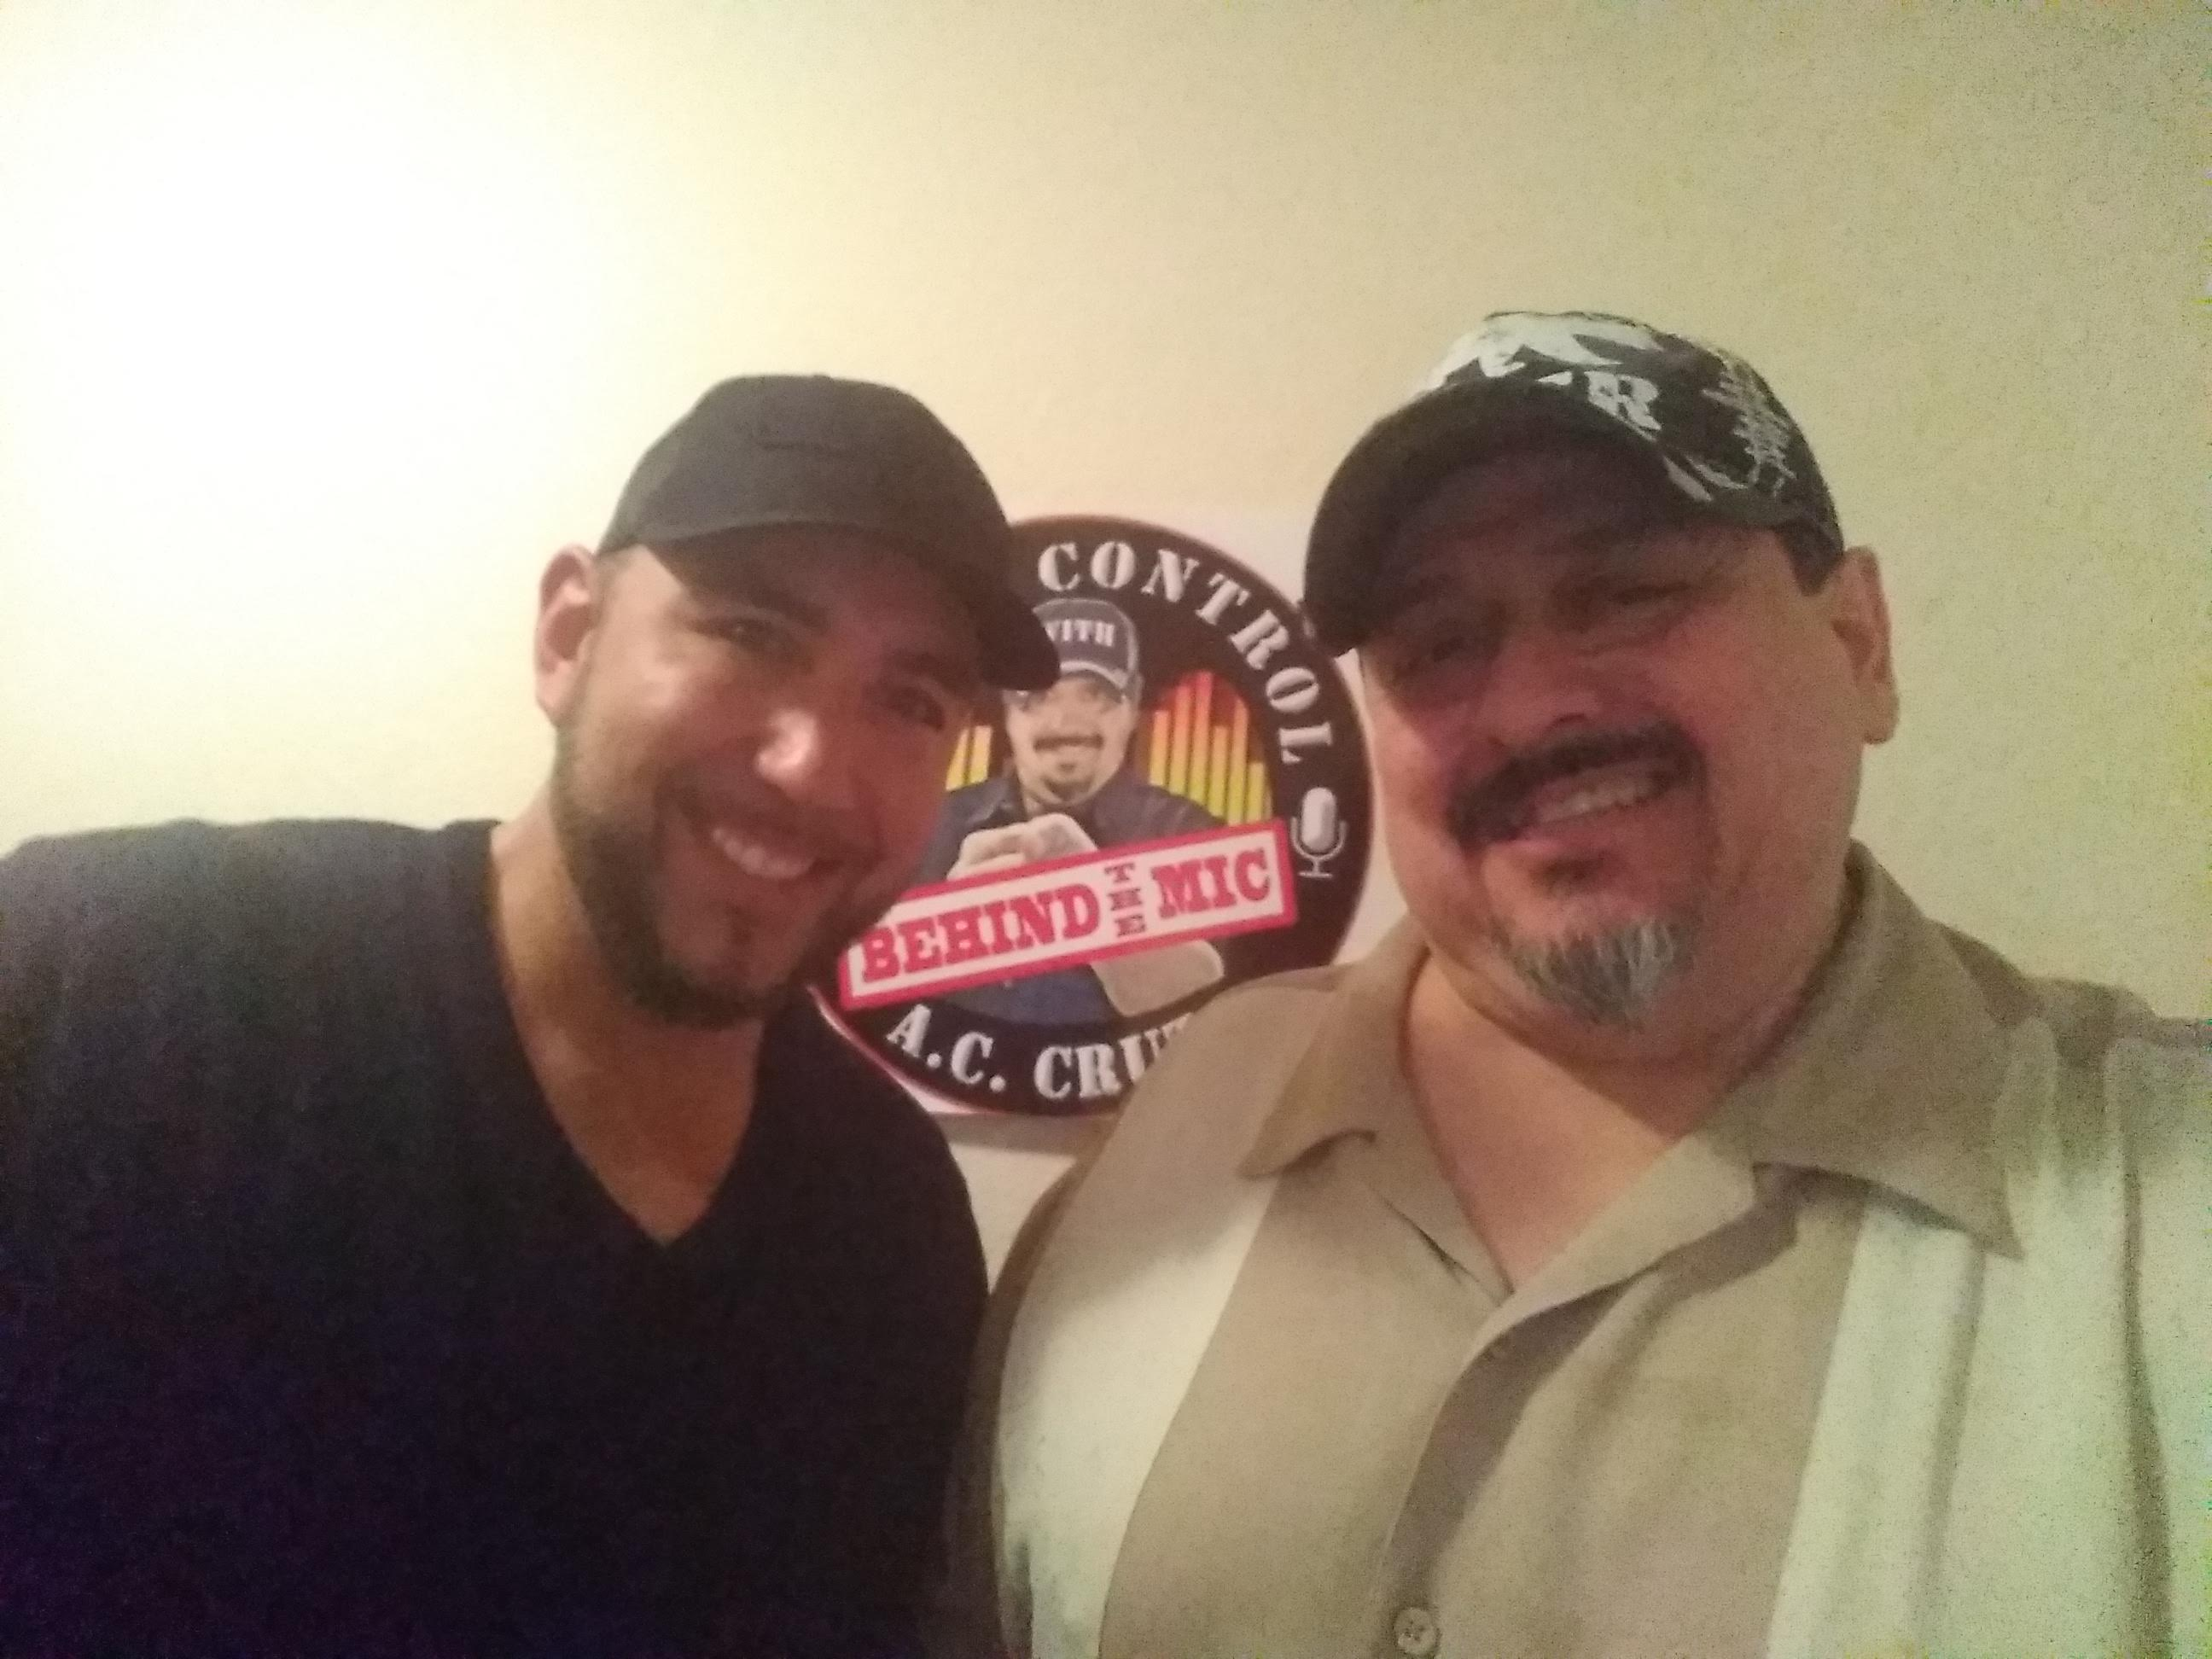 Behind the Mic with Jerry Alvarez